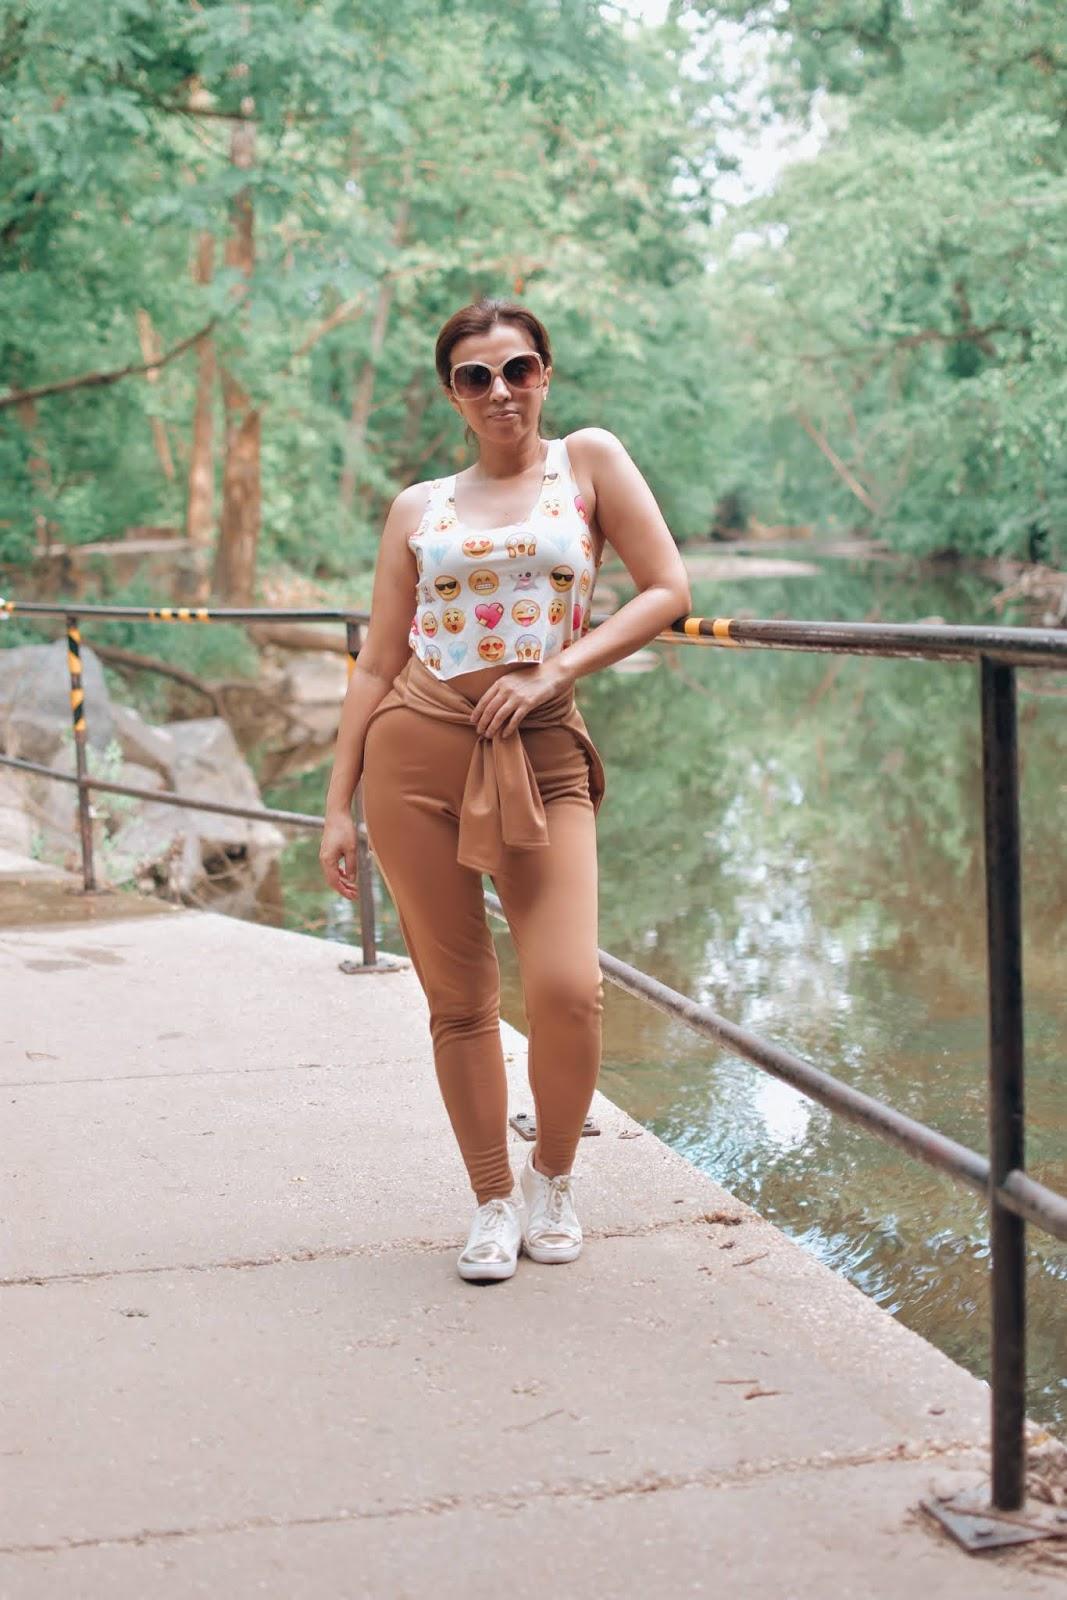 Mi Primer Paseo Después De 90 Días En Casa-cuarentena-dcblogger-streetwear-sportychic-luxegal-how lo wear sporty-